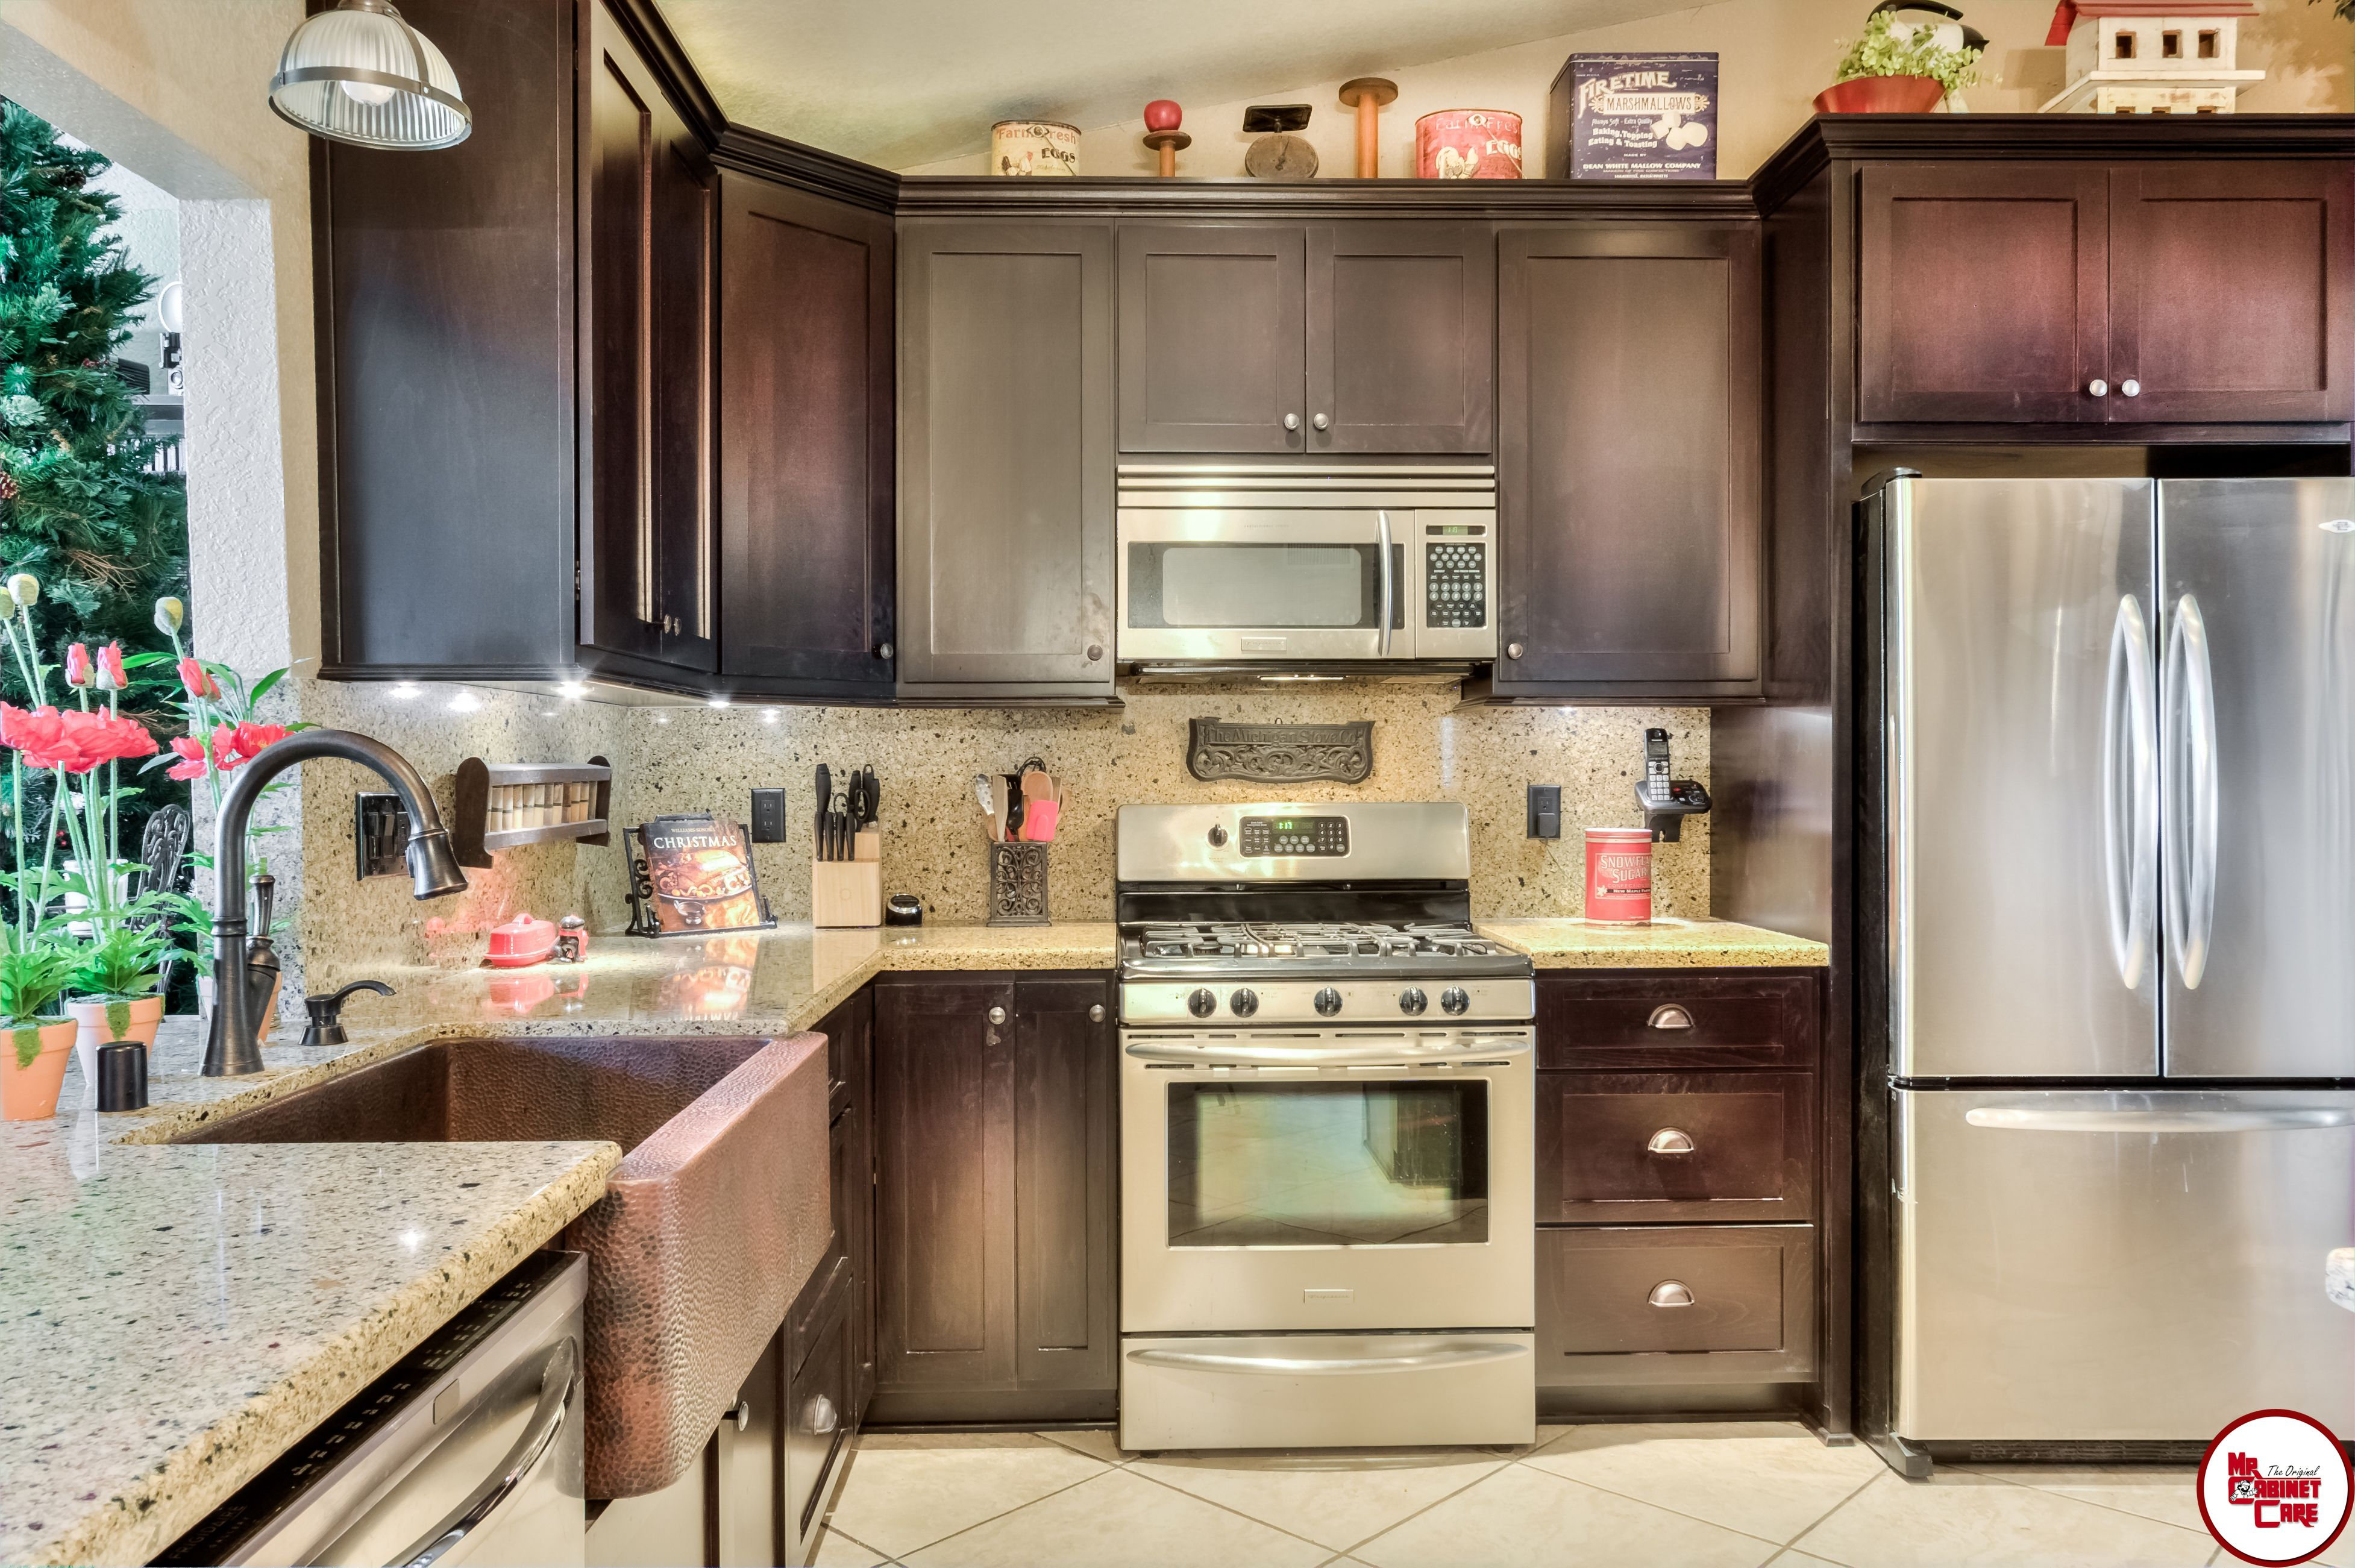 Rancho Cucamonga Kitchen Remodel Kitchen Kitchenremodel Kitchen Remodel Kitchen Design Kitchen